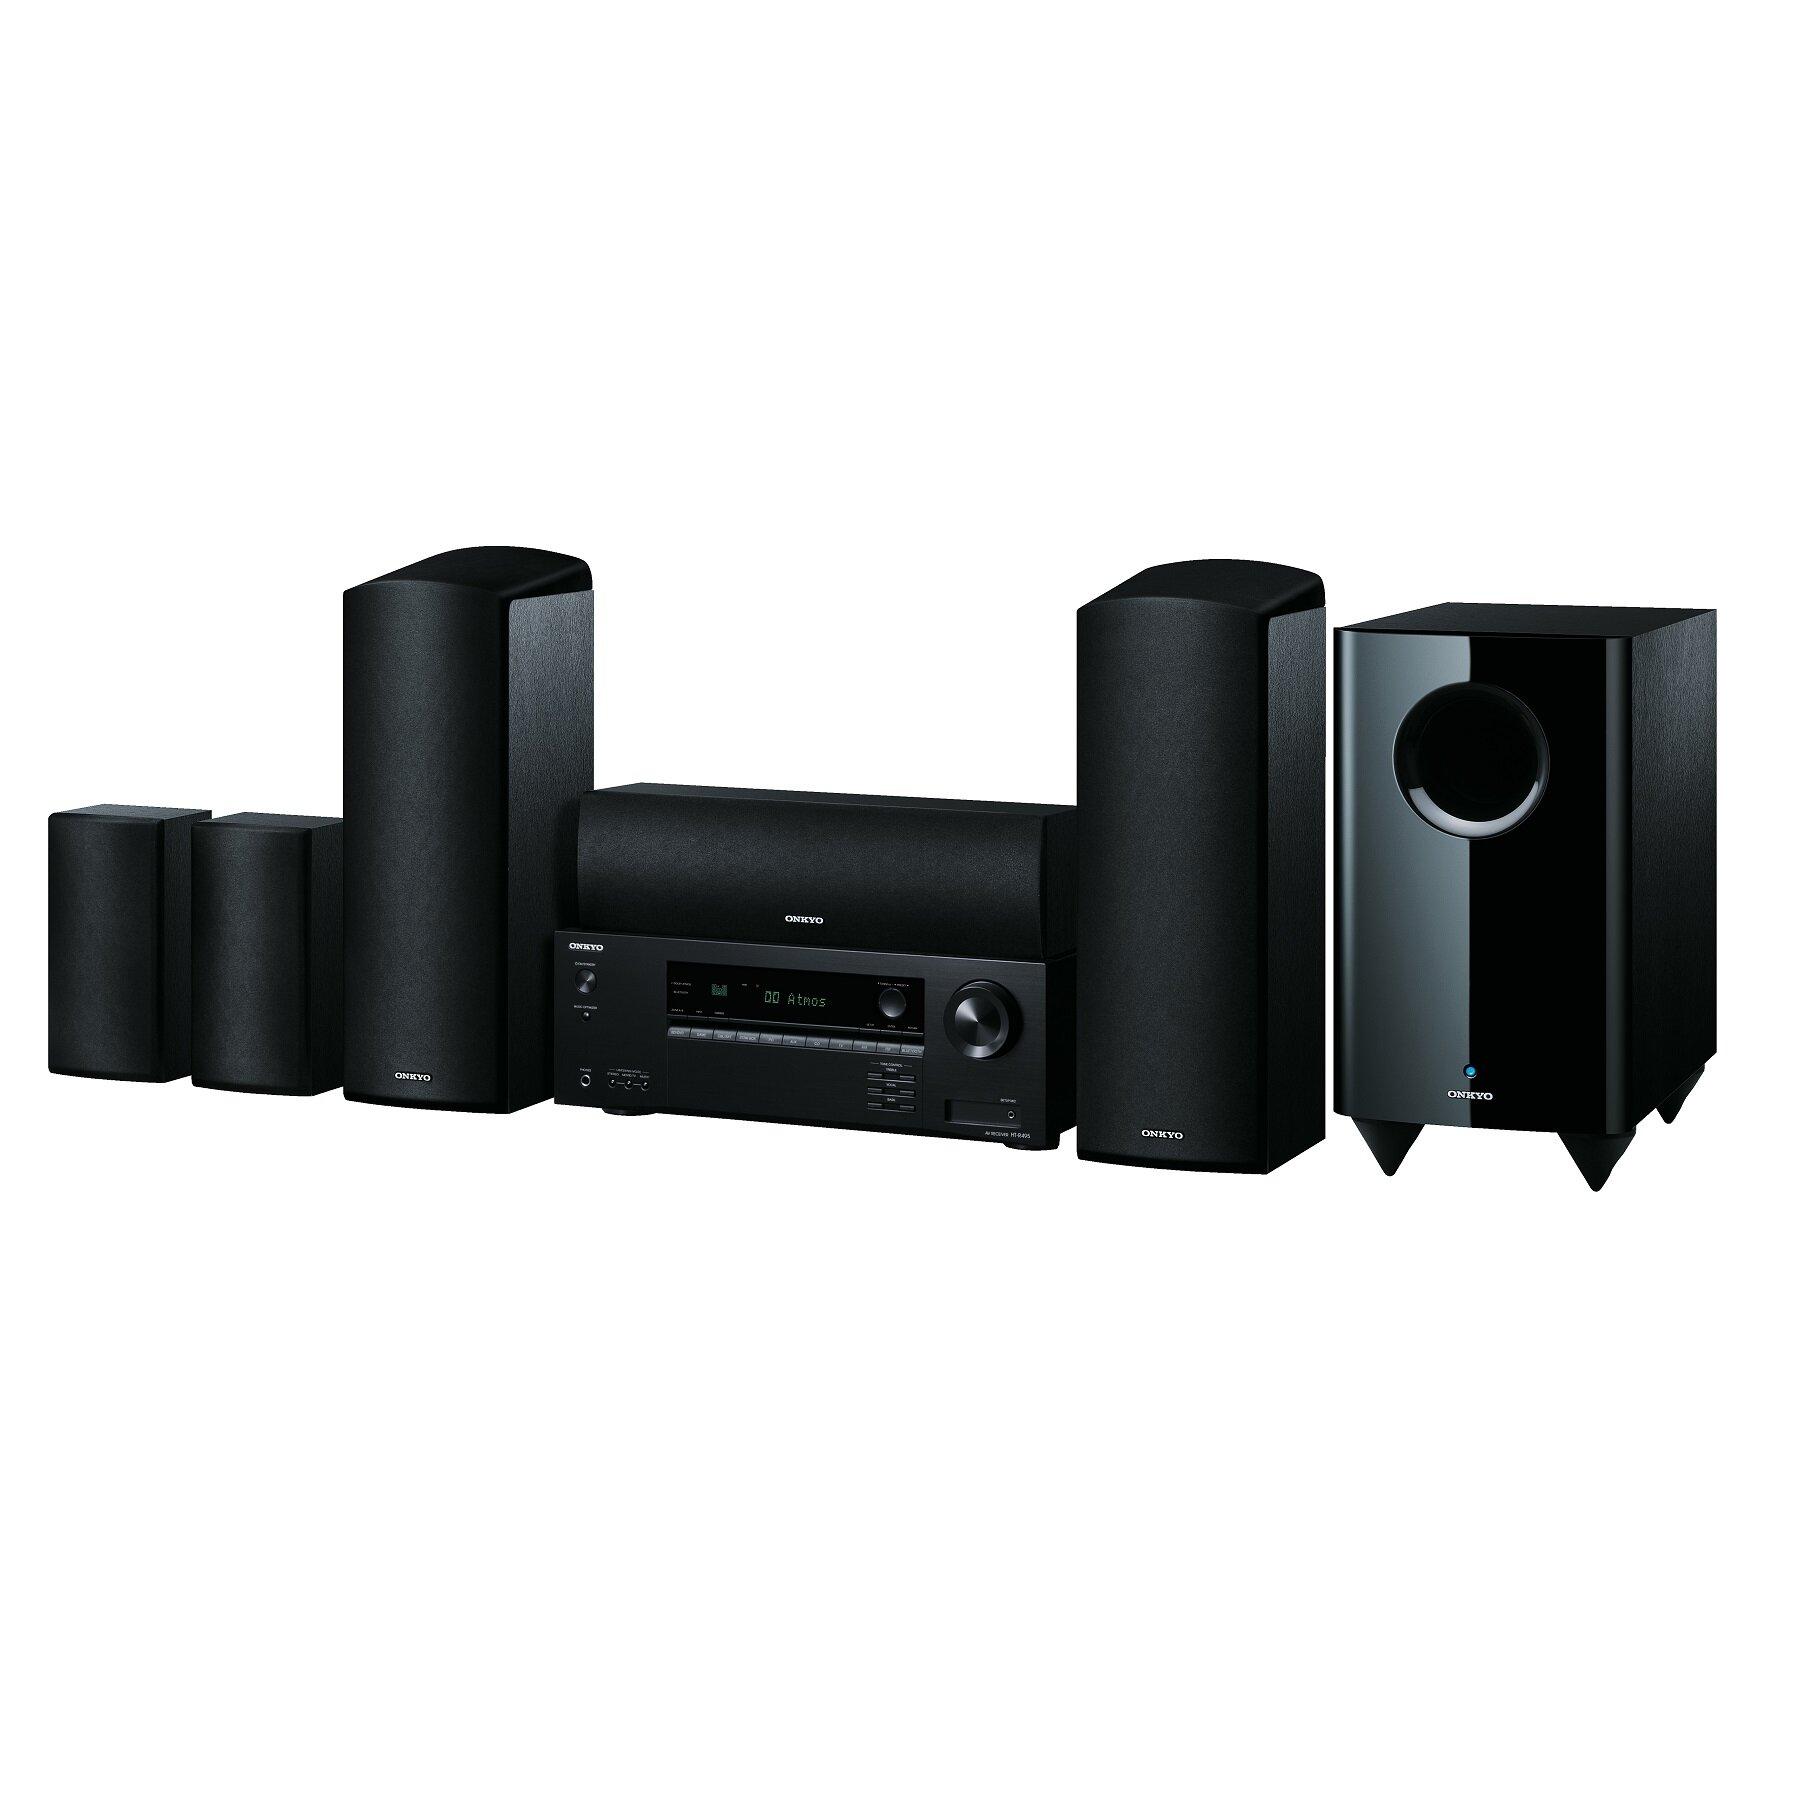 Комплекты для Dolby Atmos Onkyo HT-S5915 black